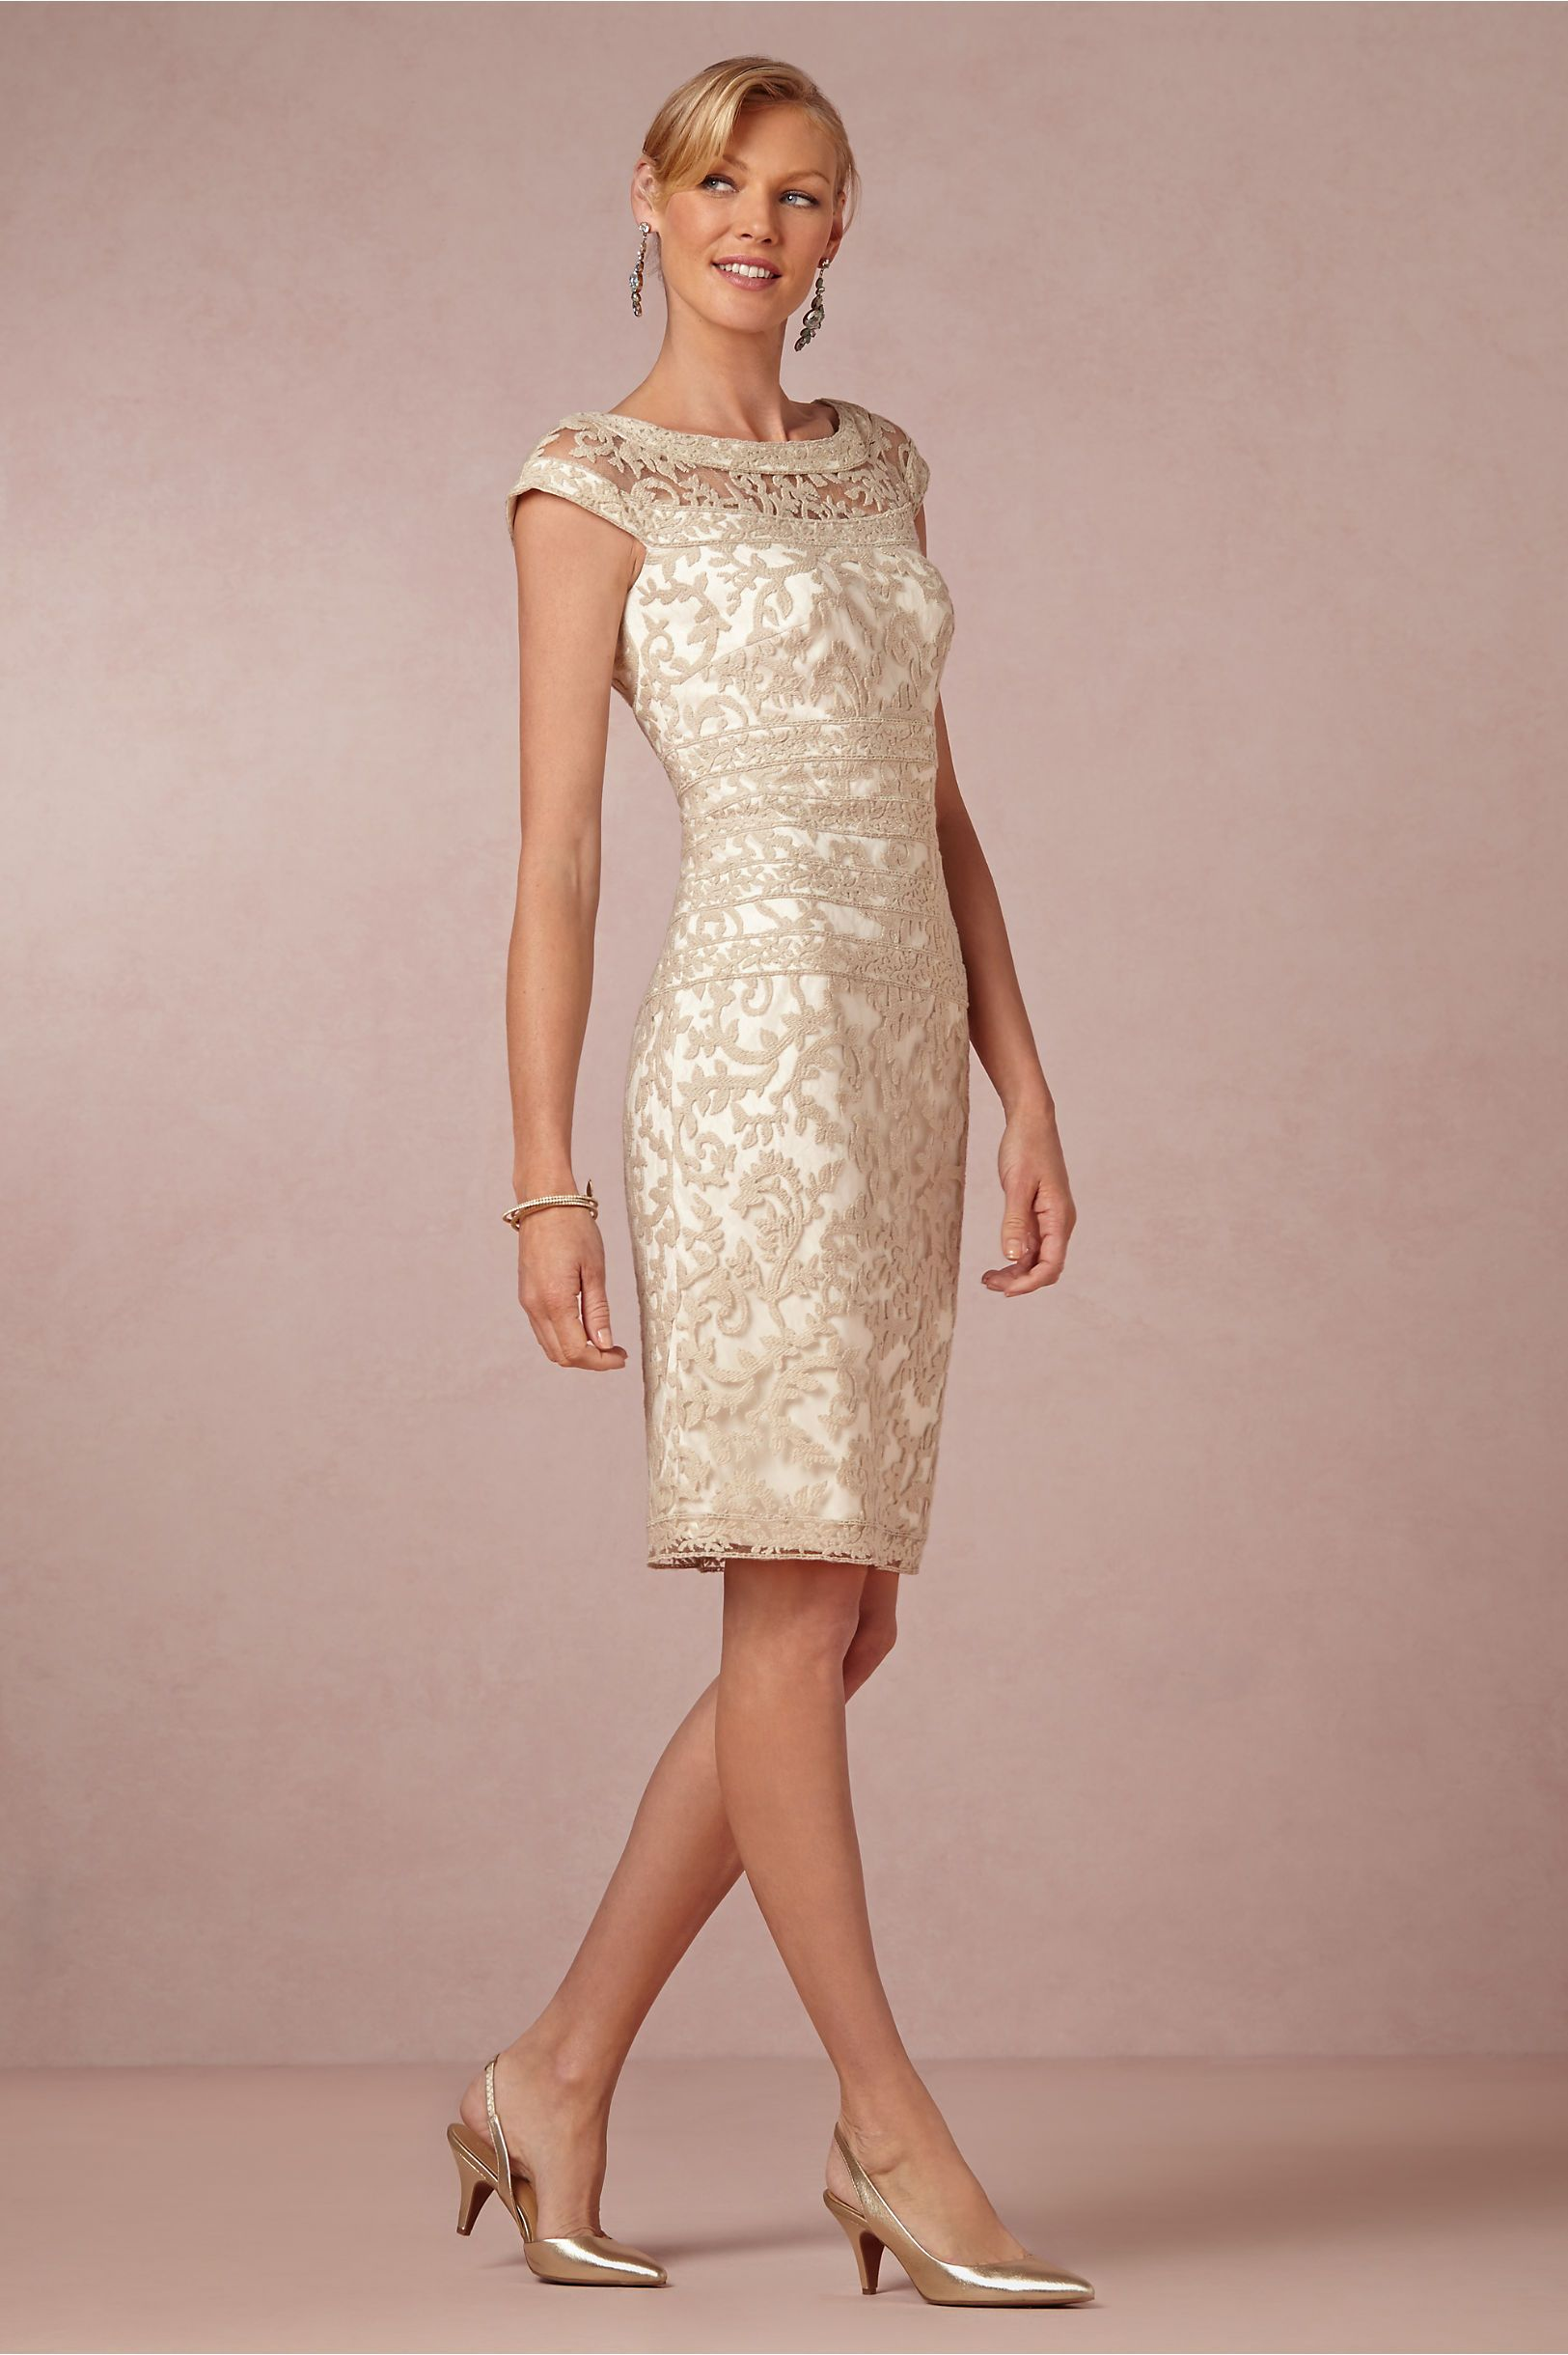 Tadashi shoji wedding guest dresses  Kinley Dress from BHLDN  Dresses  Pinterest  Party guests Bridal